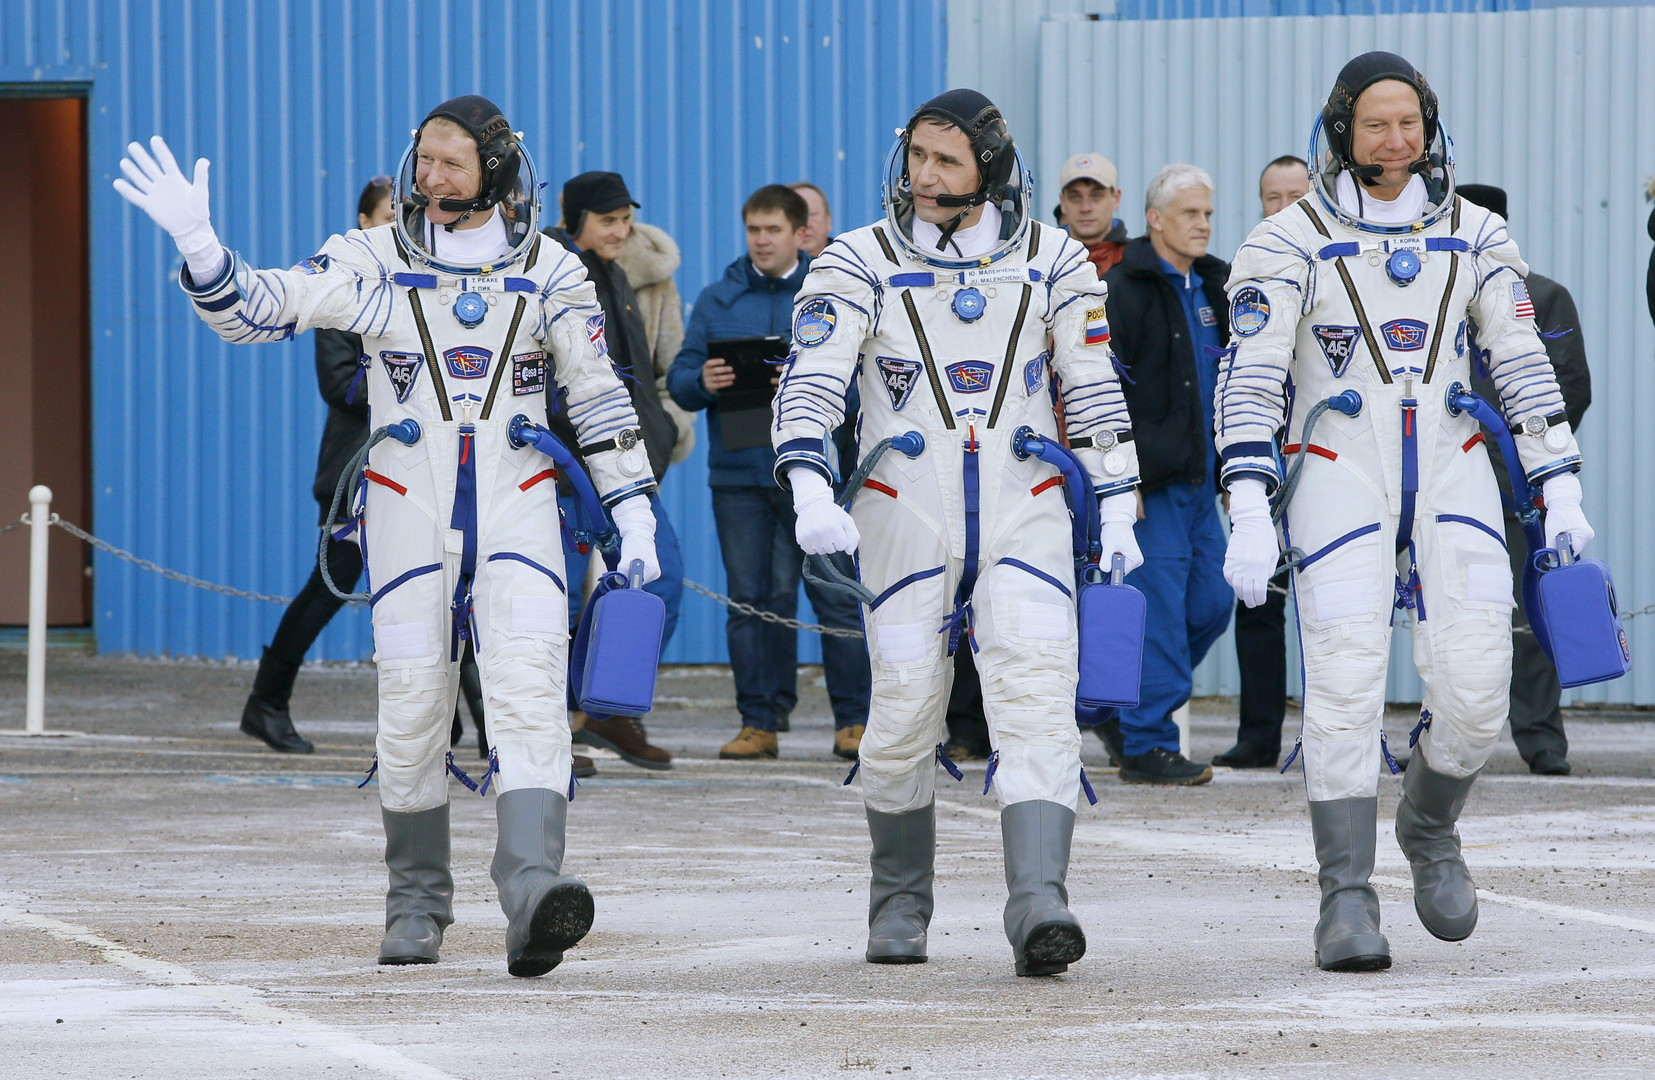 Tim Peake, Youri Malenchenko et Tim Kopra